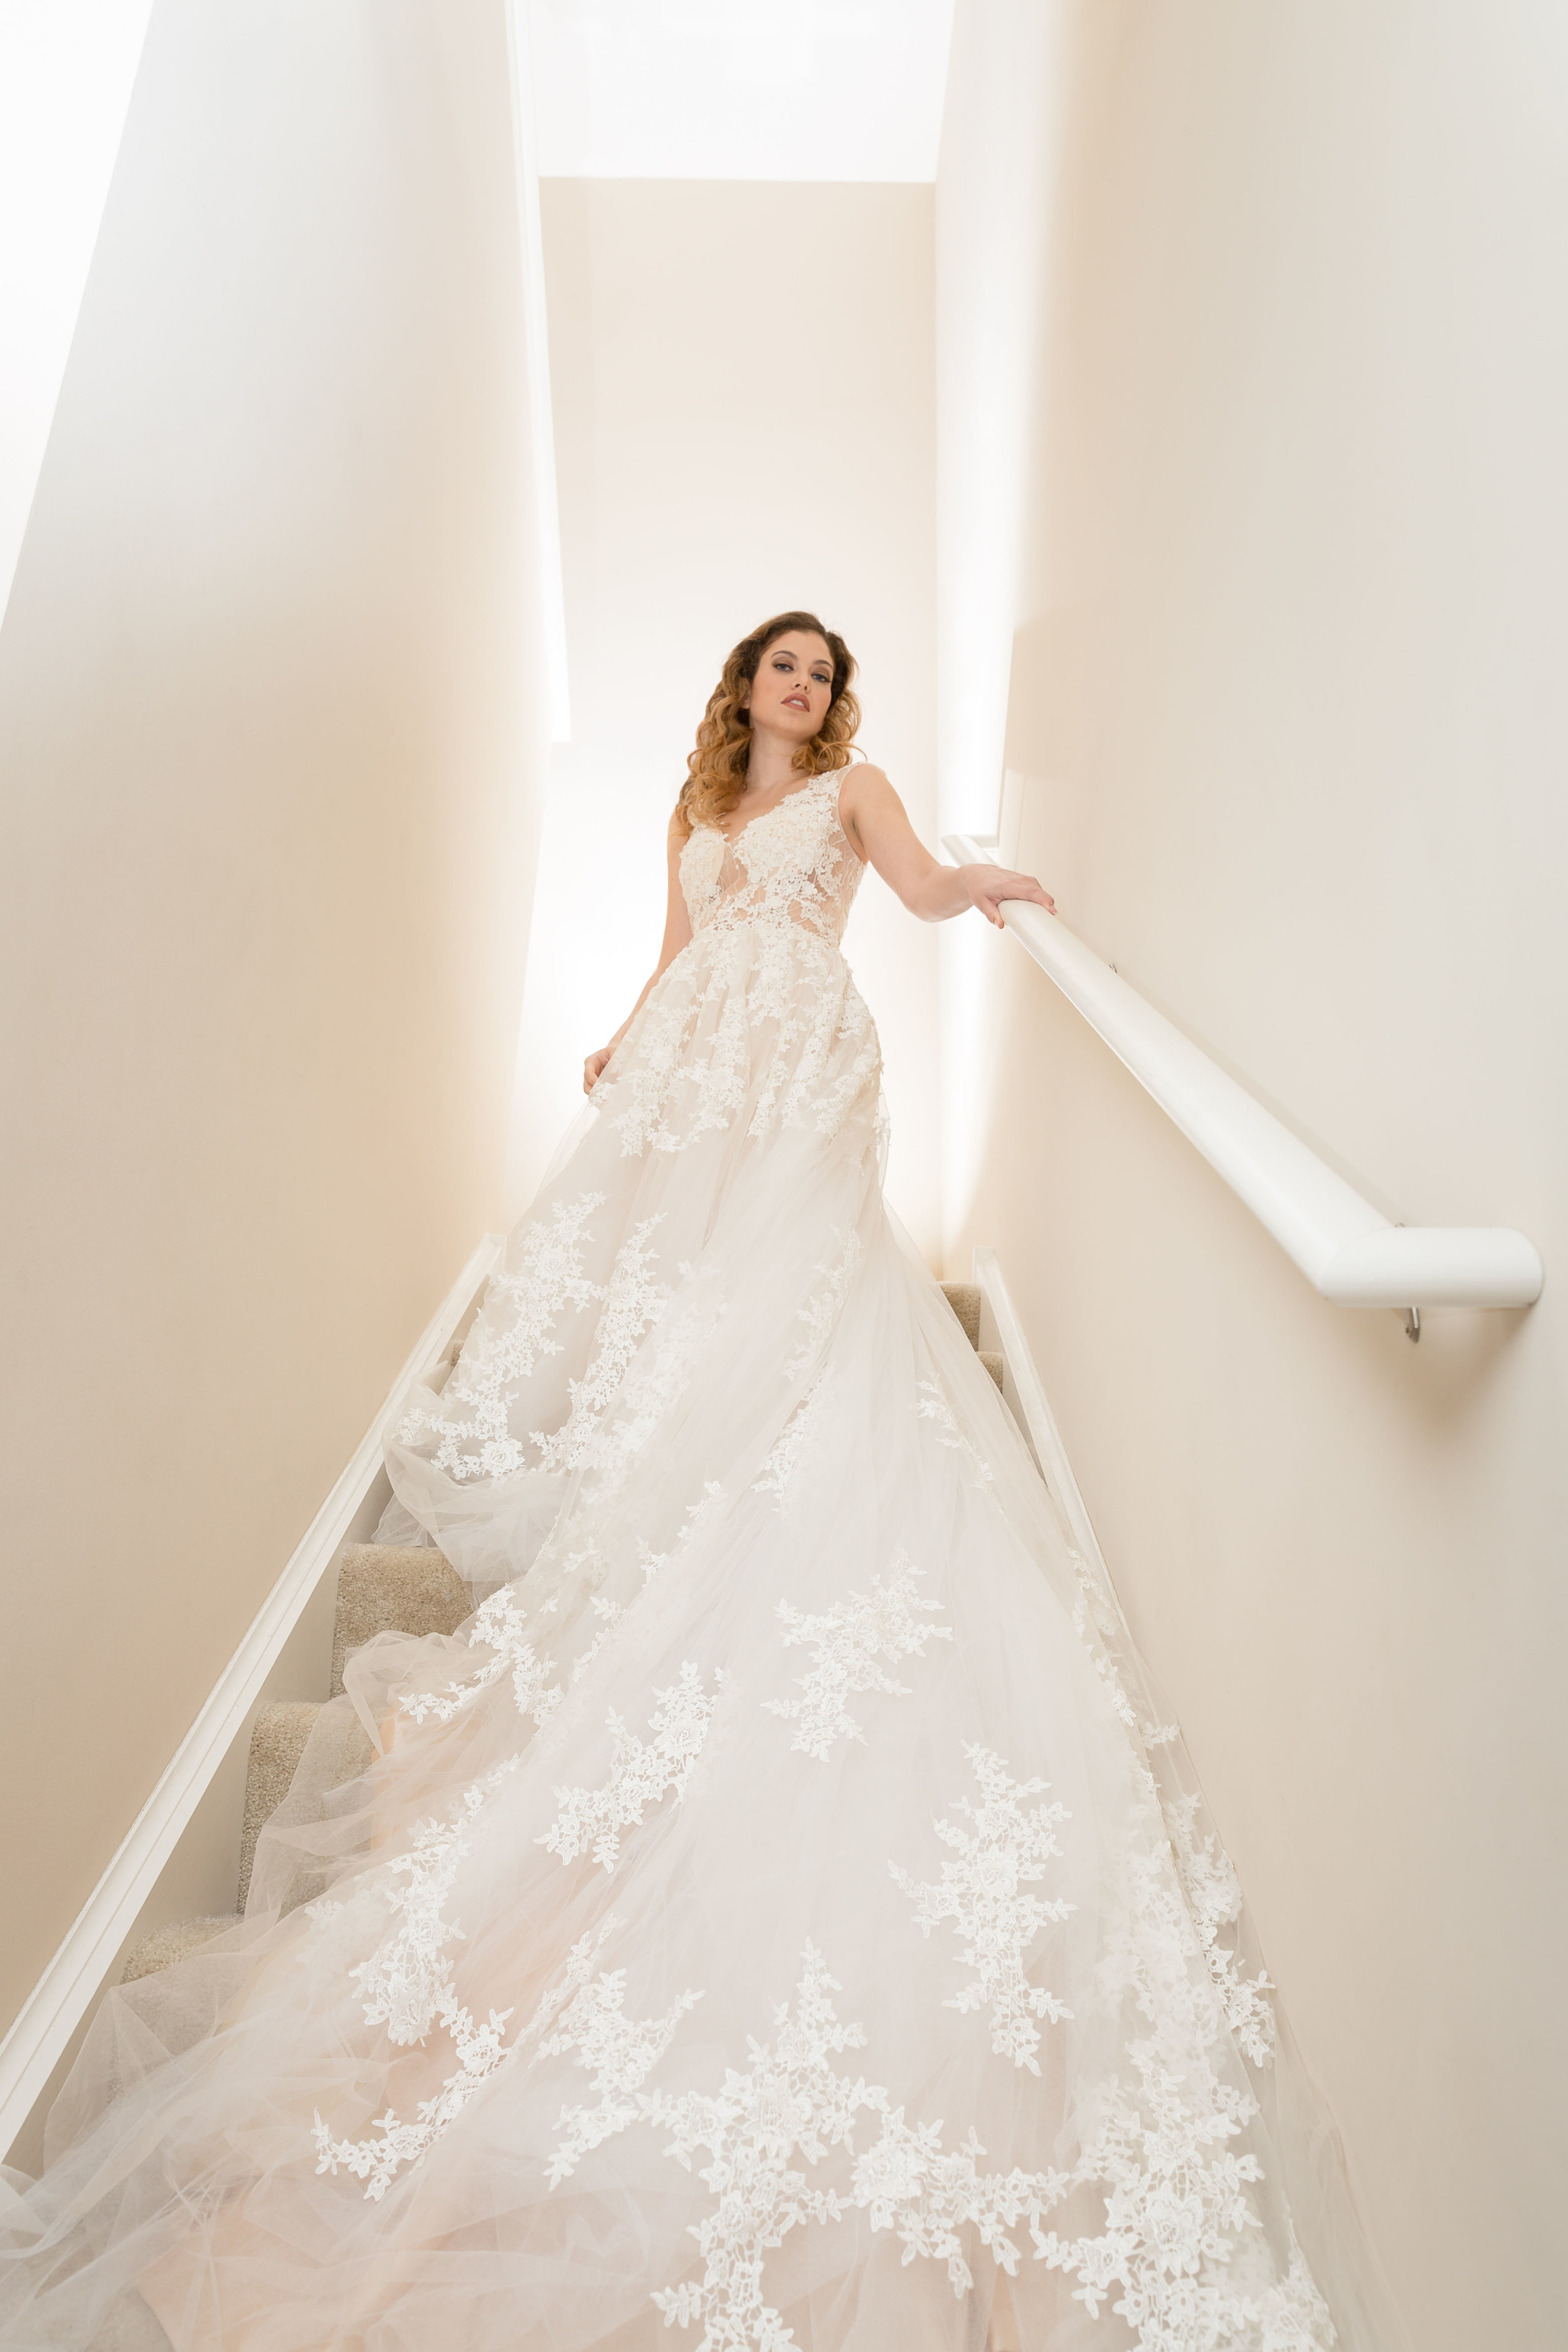 JVaughn_Photography_Weddings_Huntley_Photographer_Professional_Wedding0314.jpg